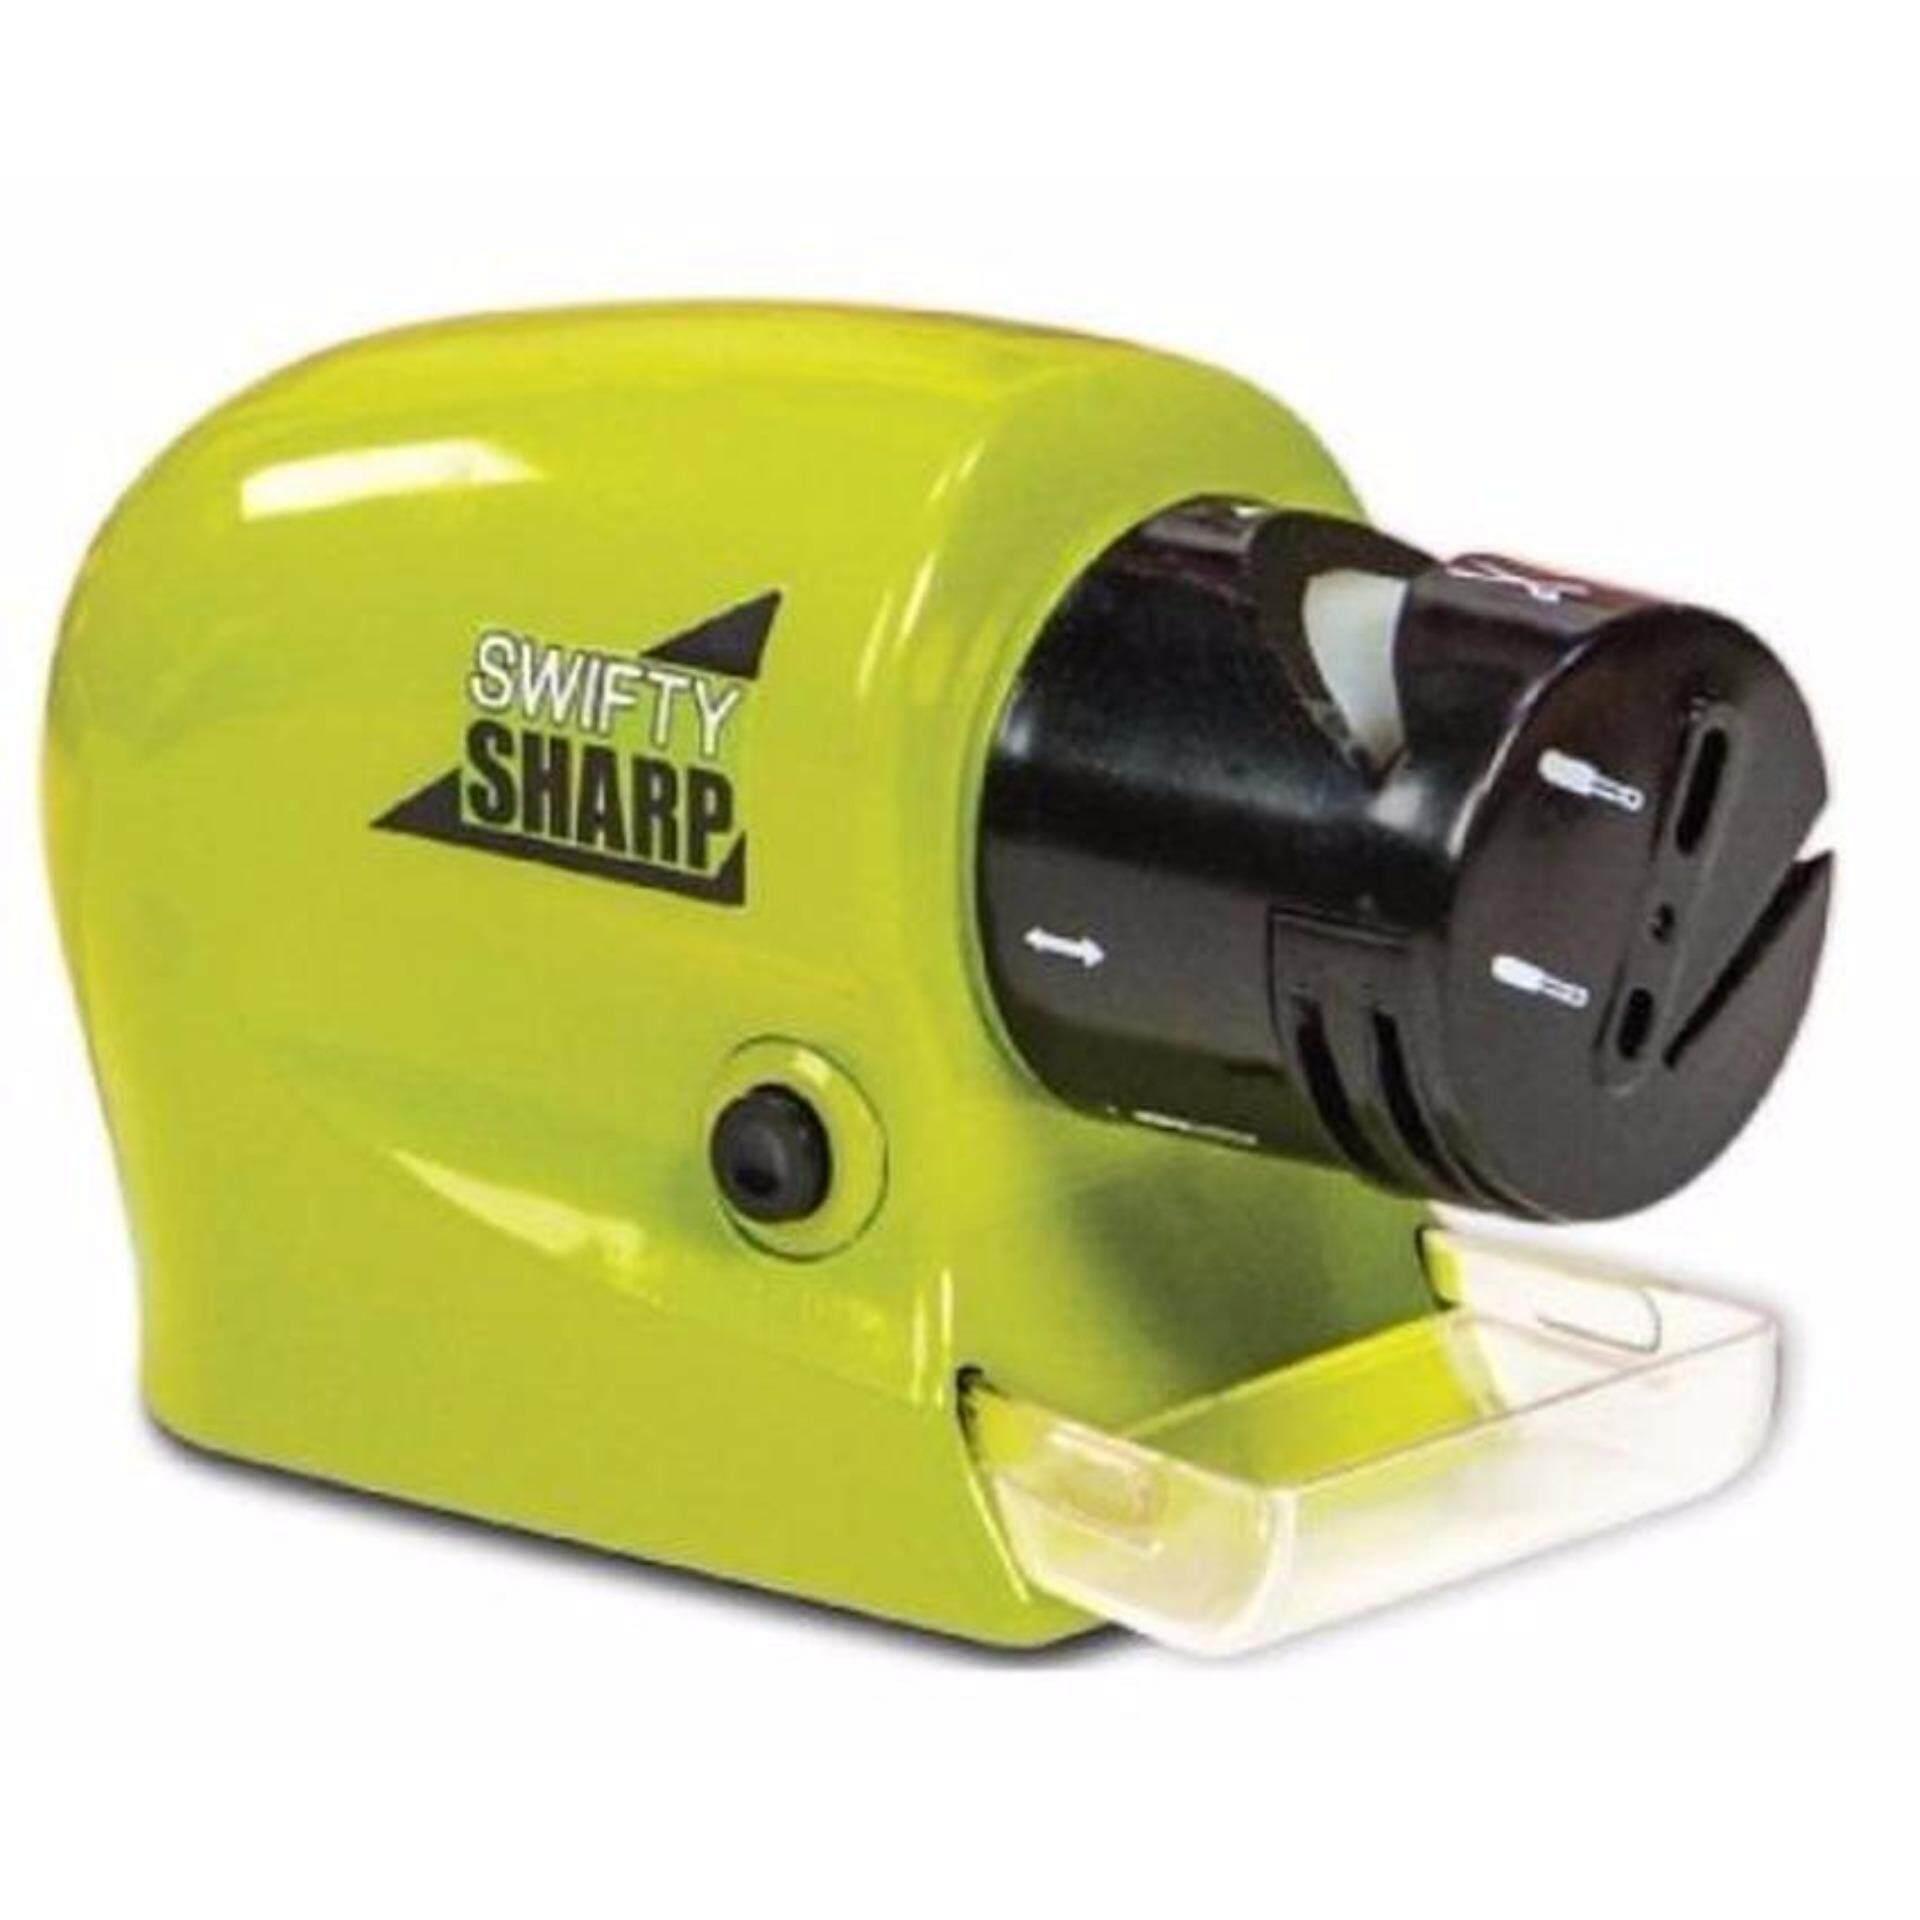 Inside our mobile sharpening shop - Swifty Sharp Electric Knife Sharpener